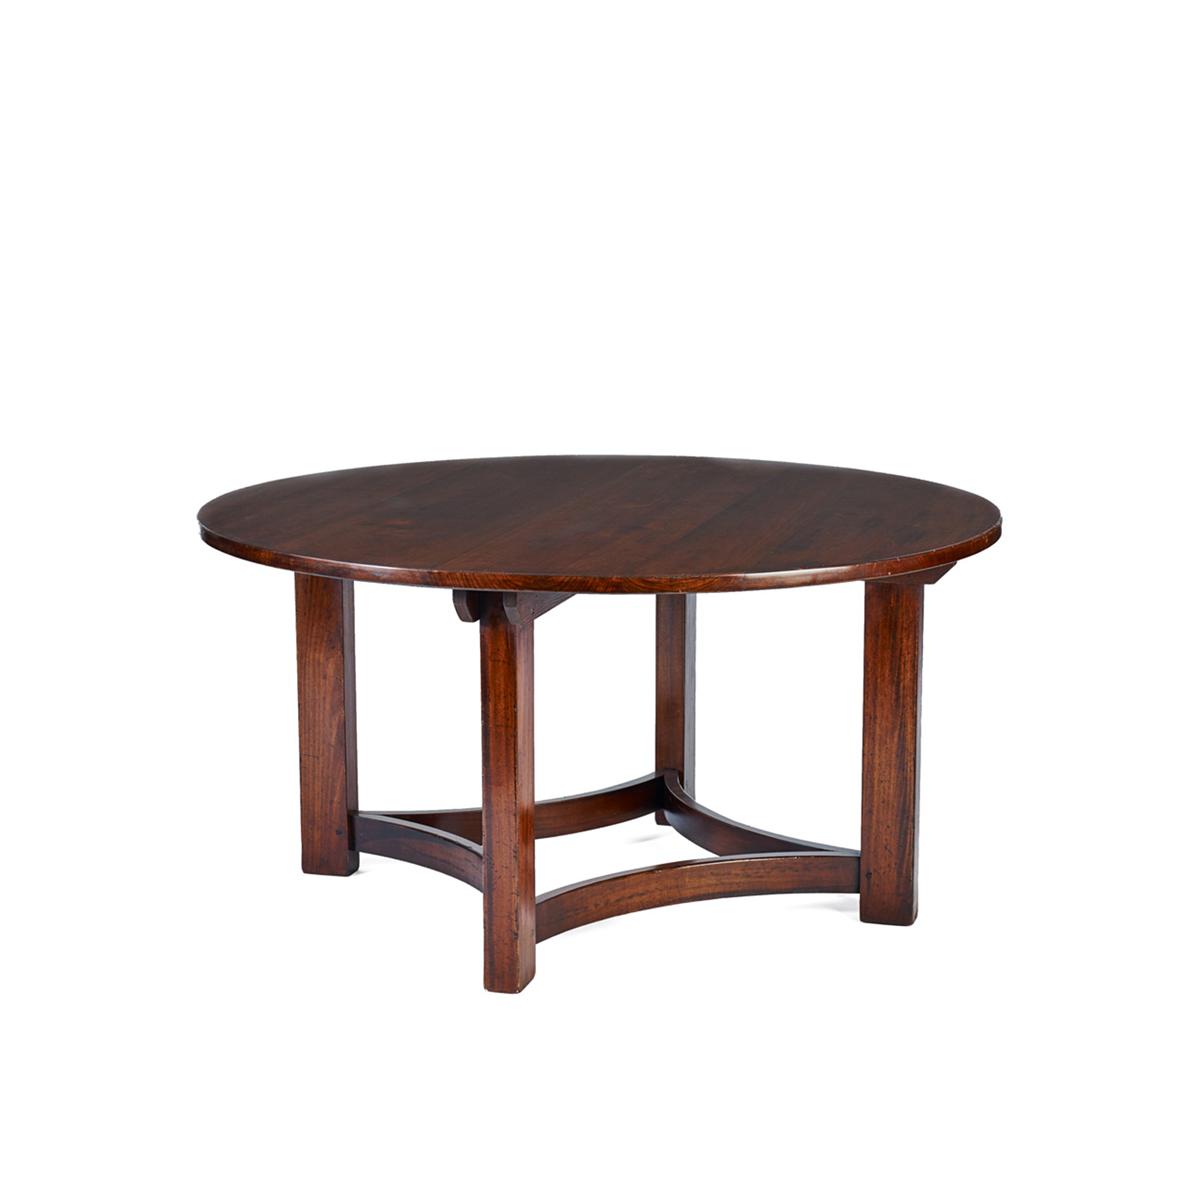 Applecross-Dining-Table#2_For-Web.jpg